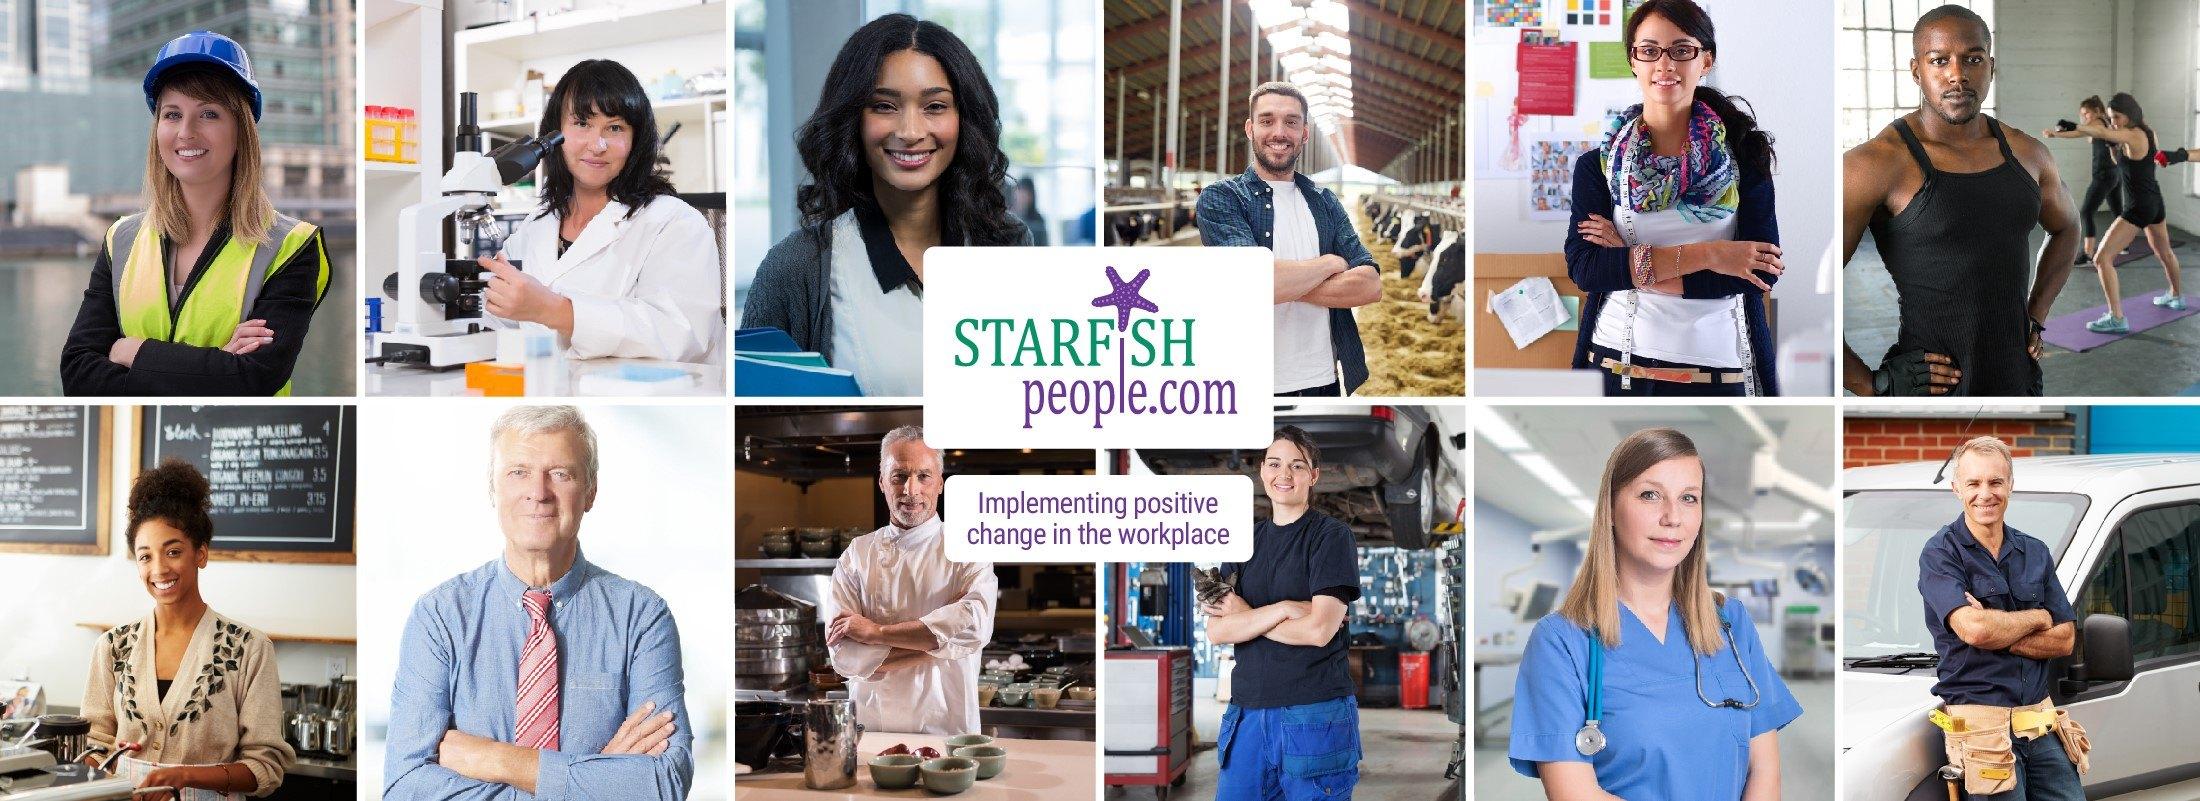 Starfish People